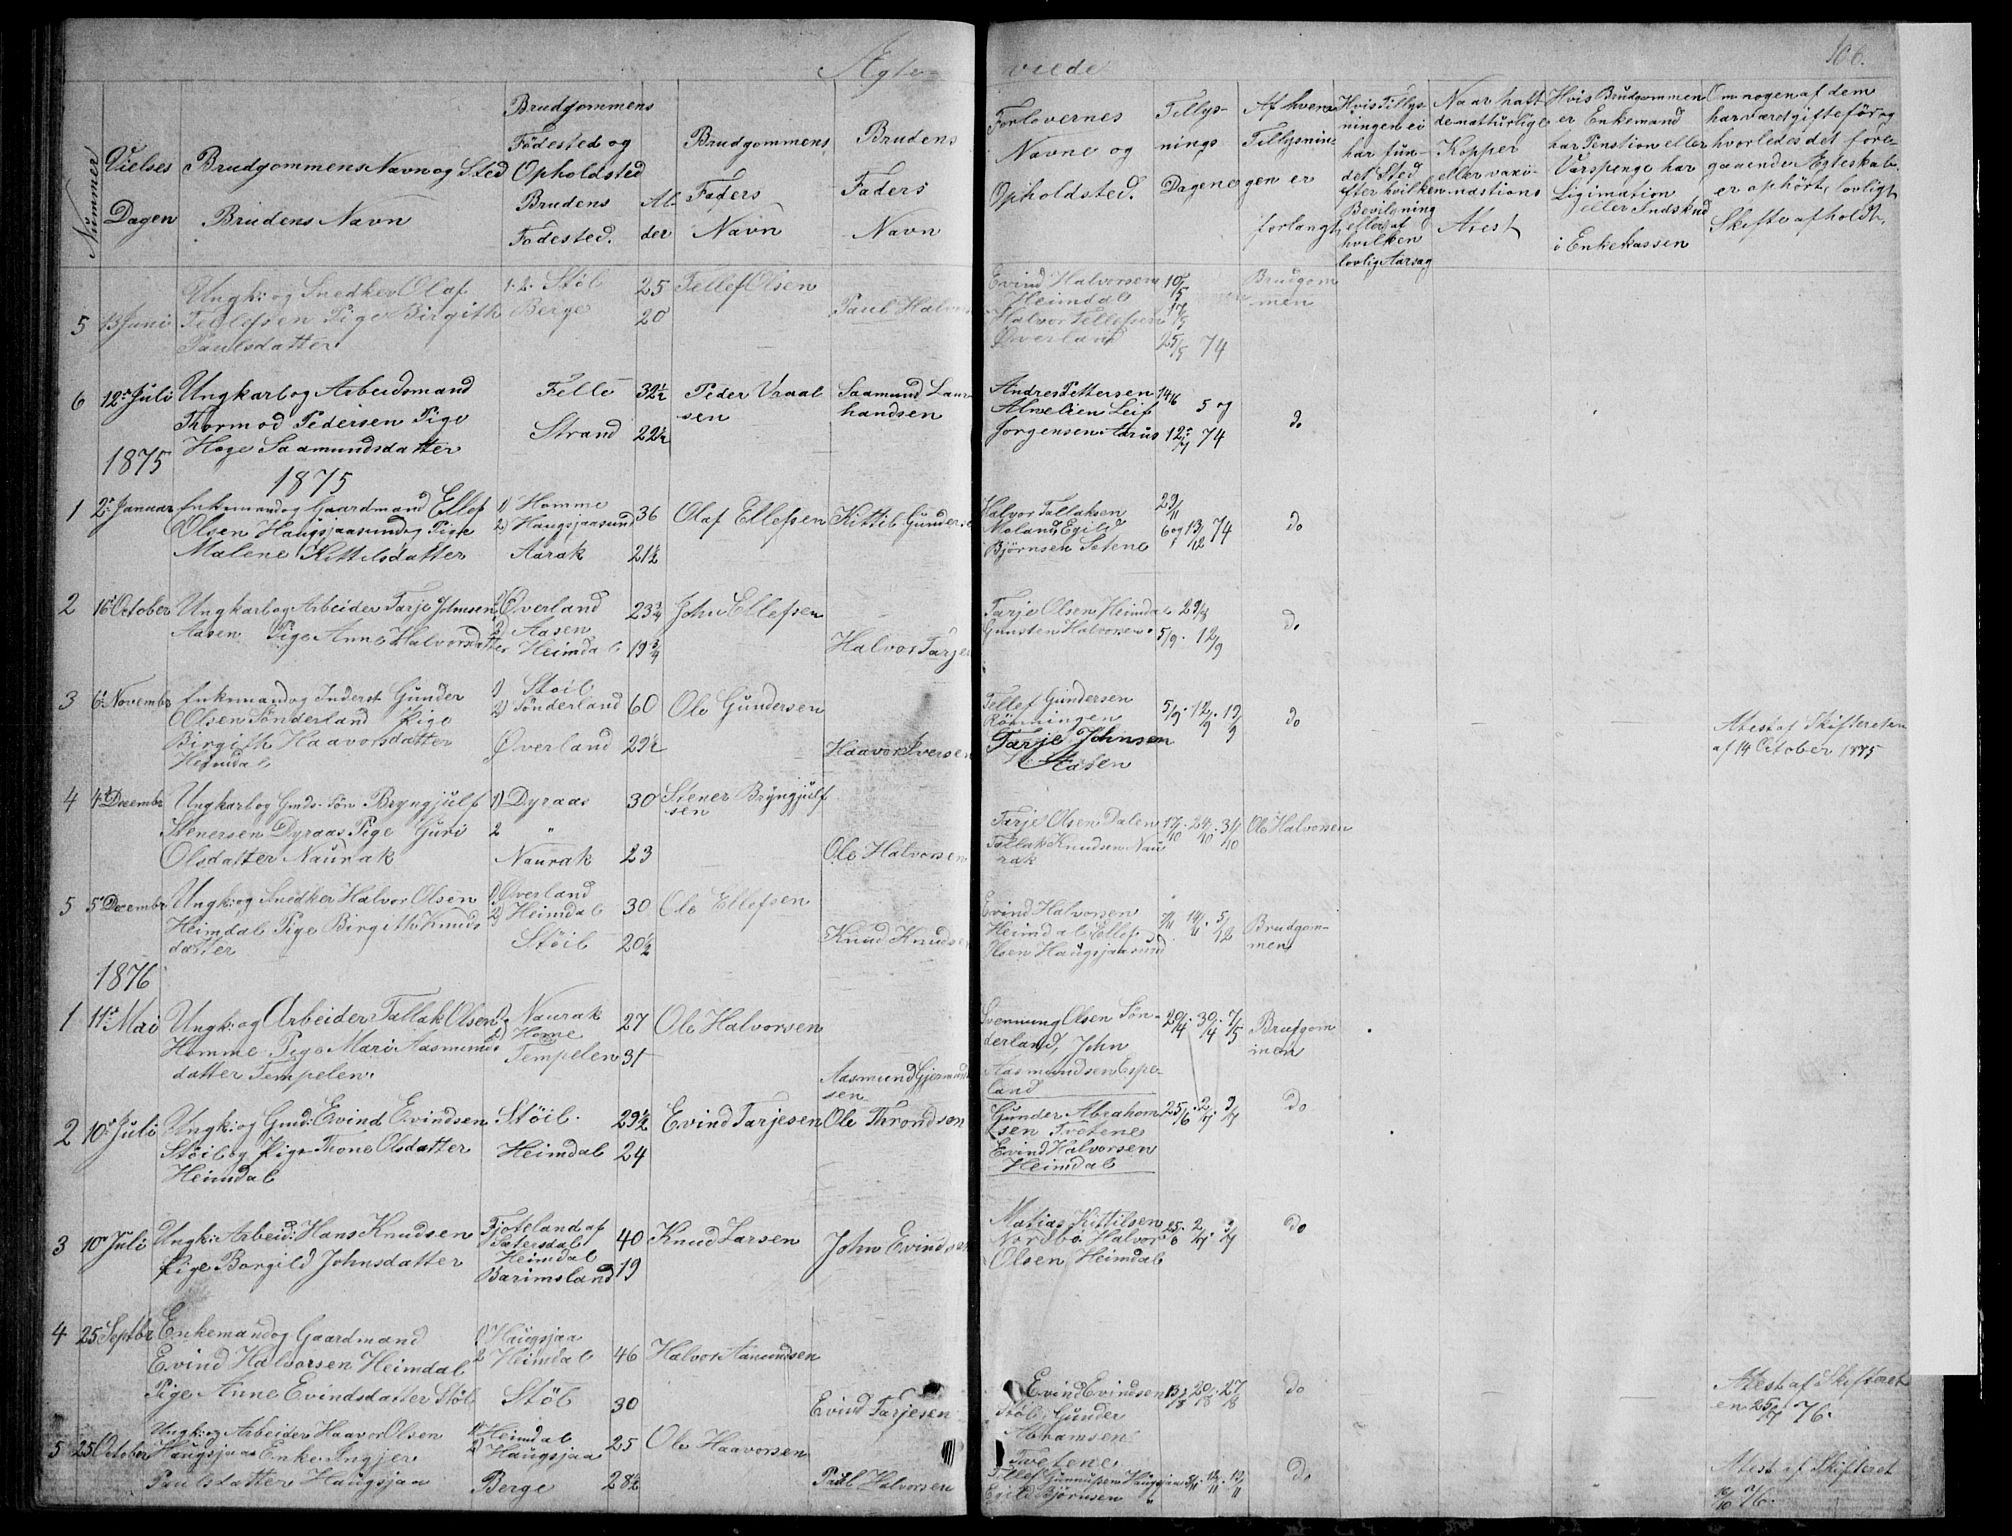 SAKO, Nissedal kirkebøker, G/Gb/L0002: Klokkerbok nr. II 2, 1863-1892, s. 106